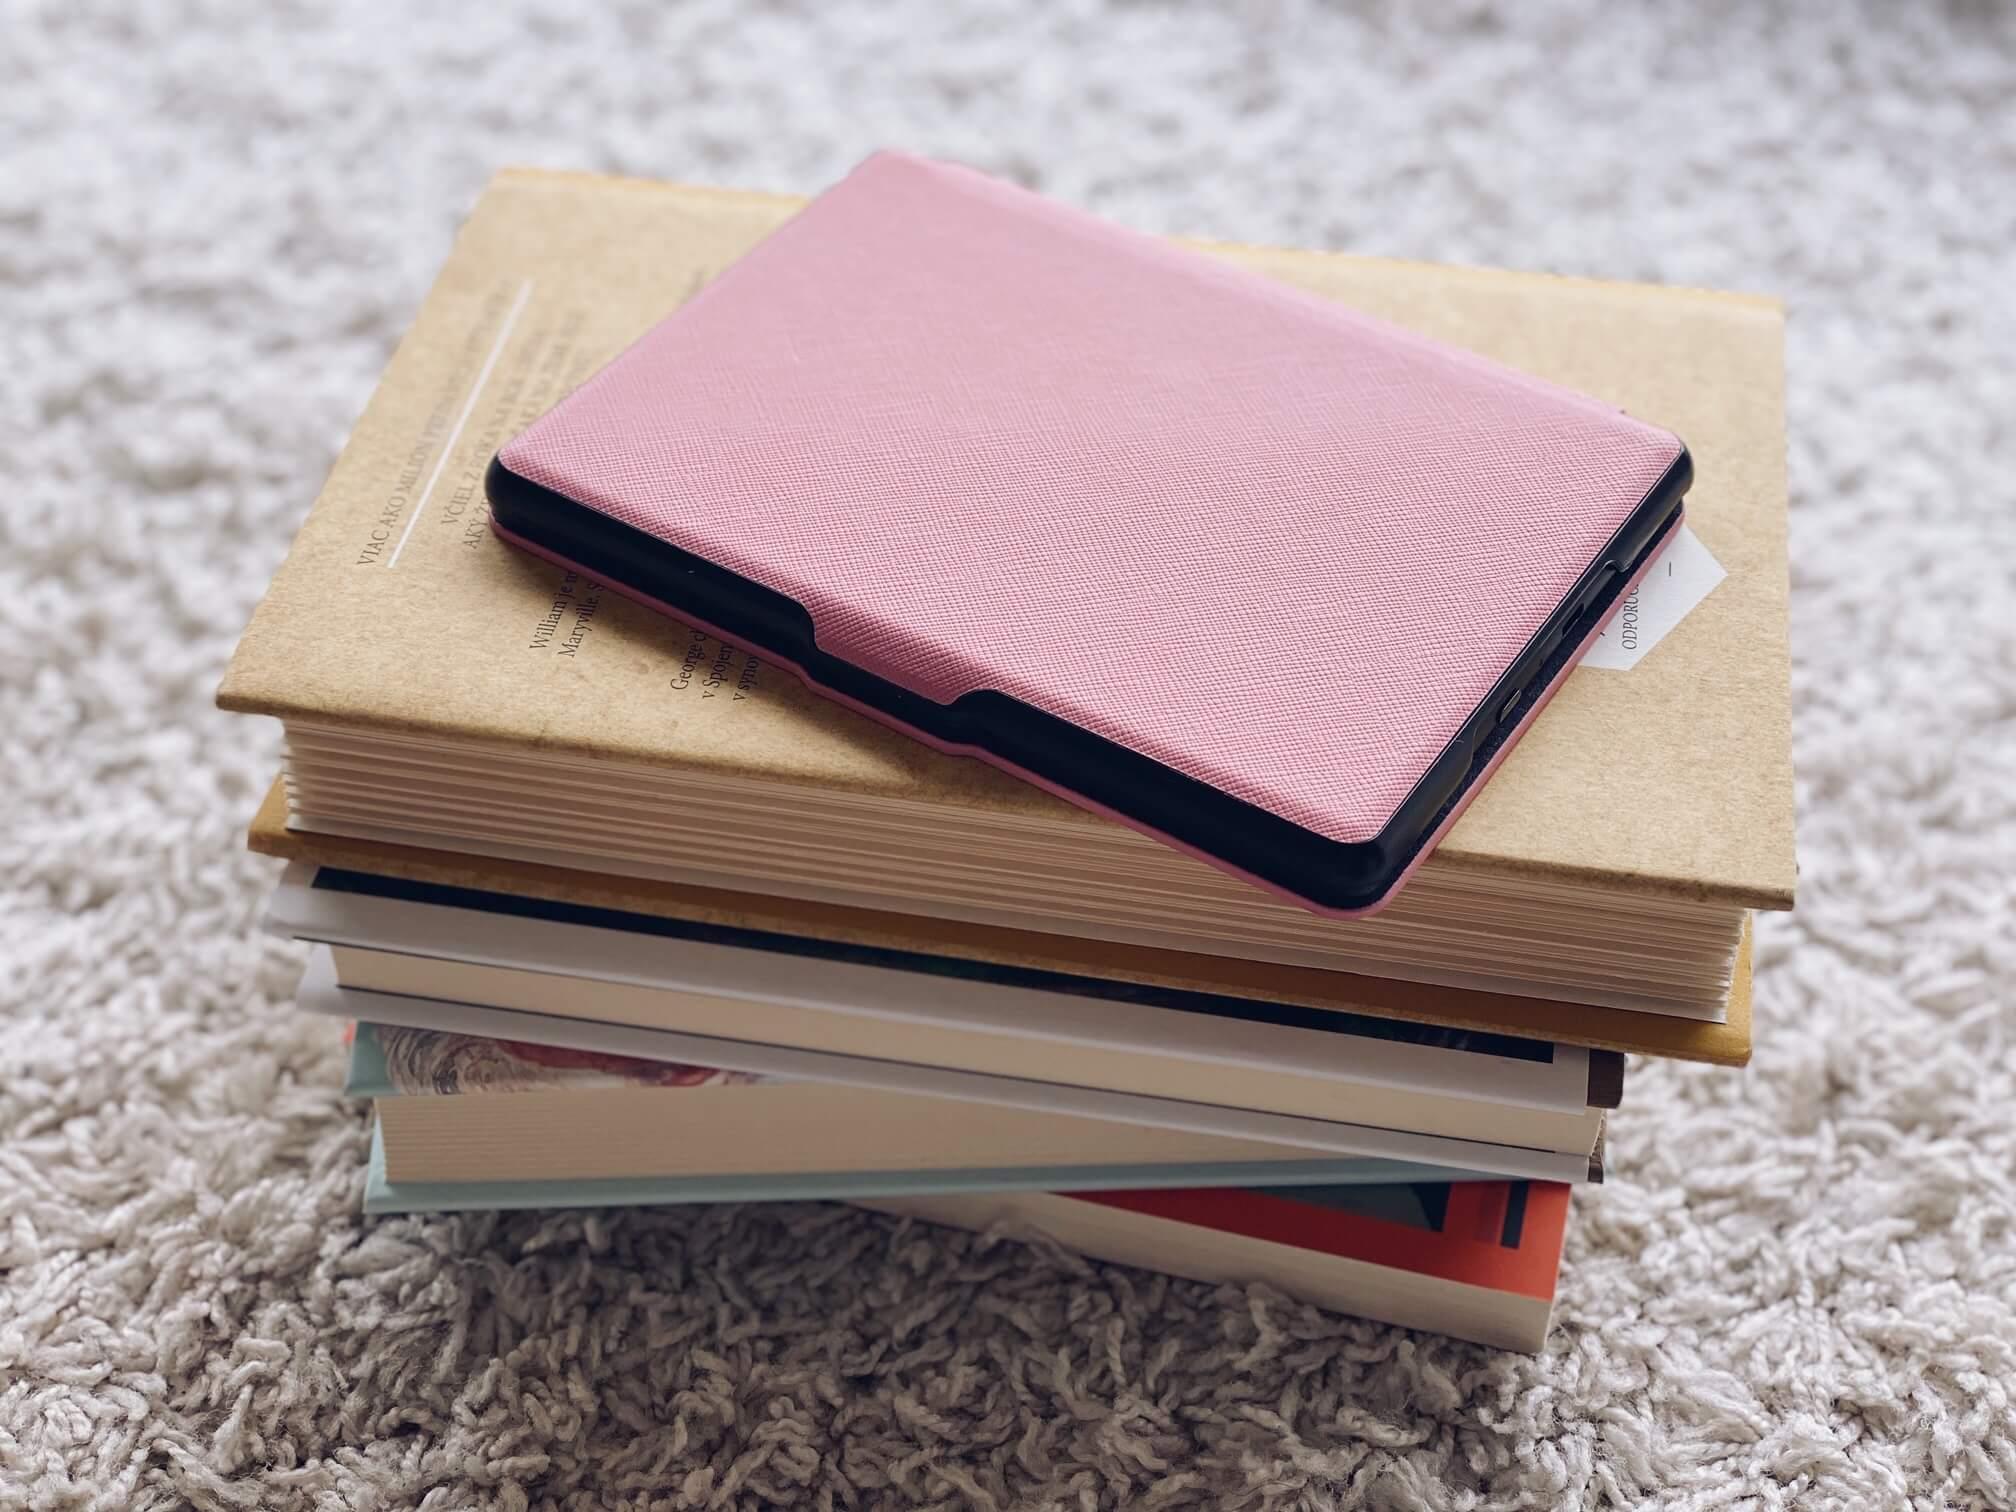 Knihy a elektronická čítačka kníh